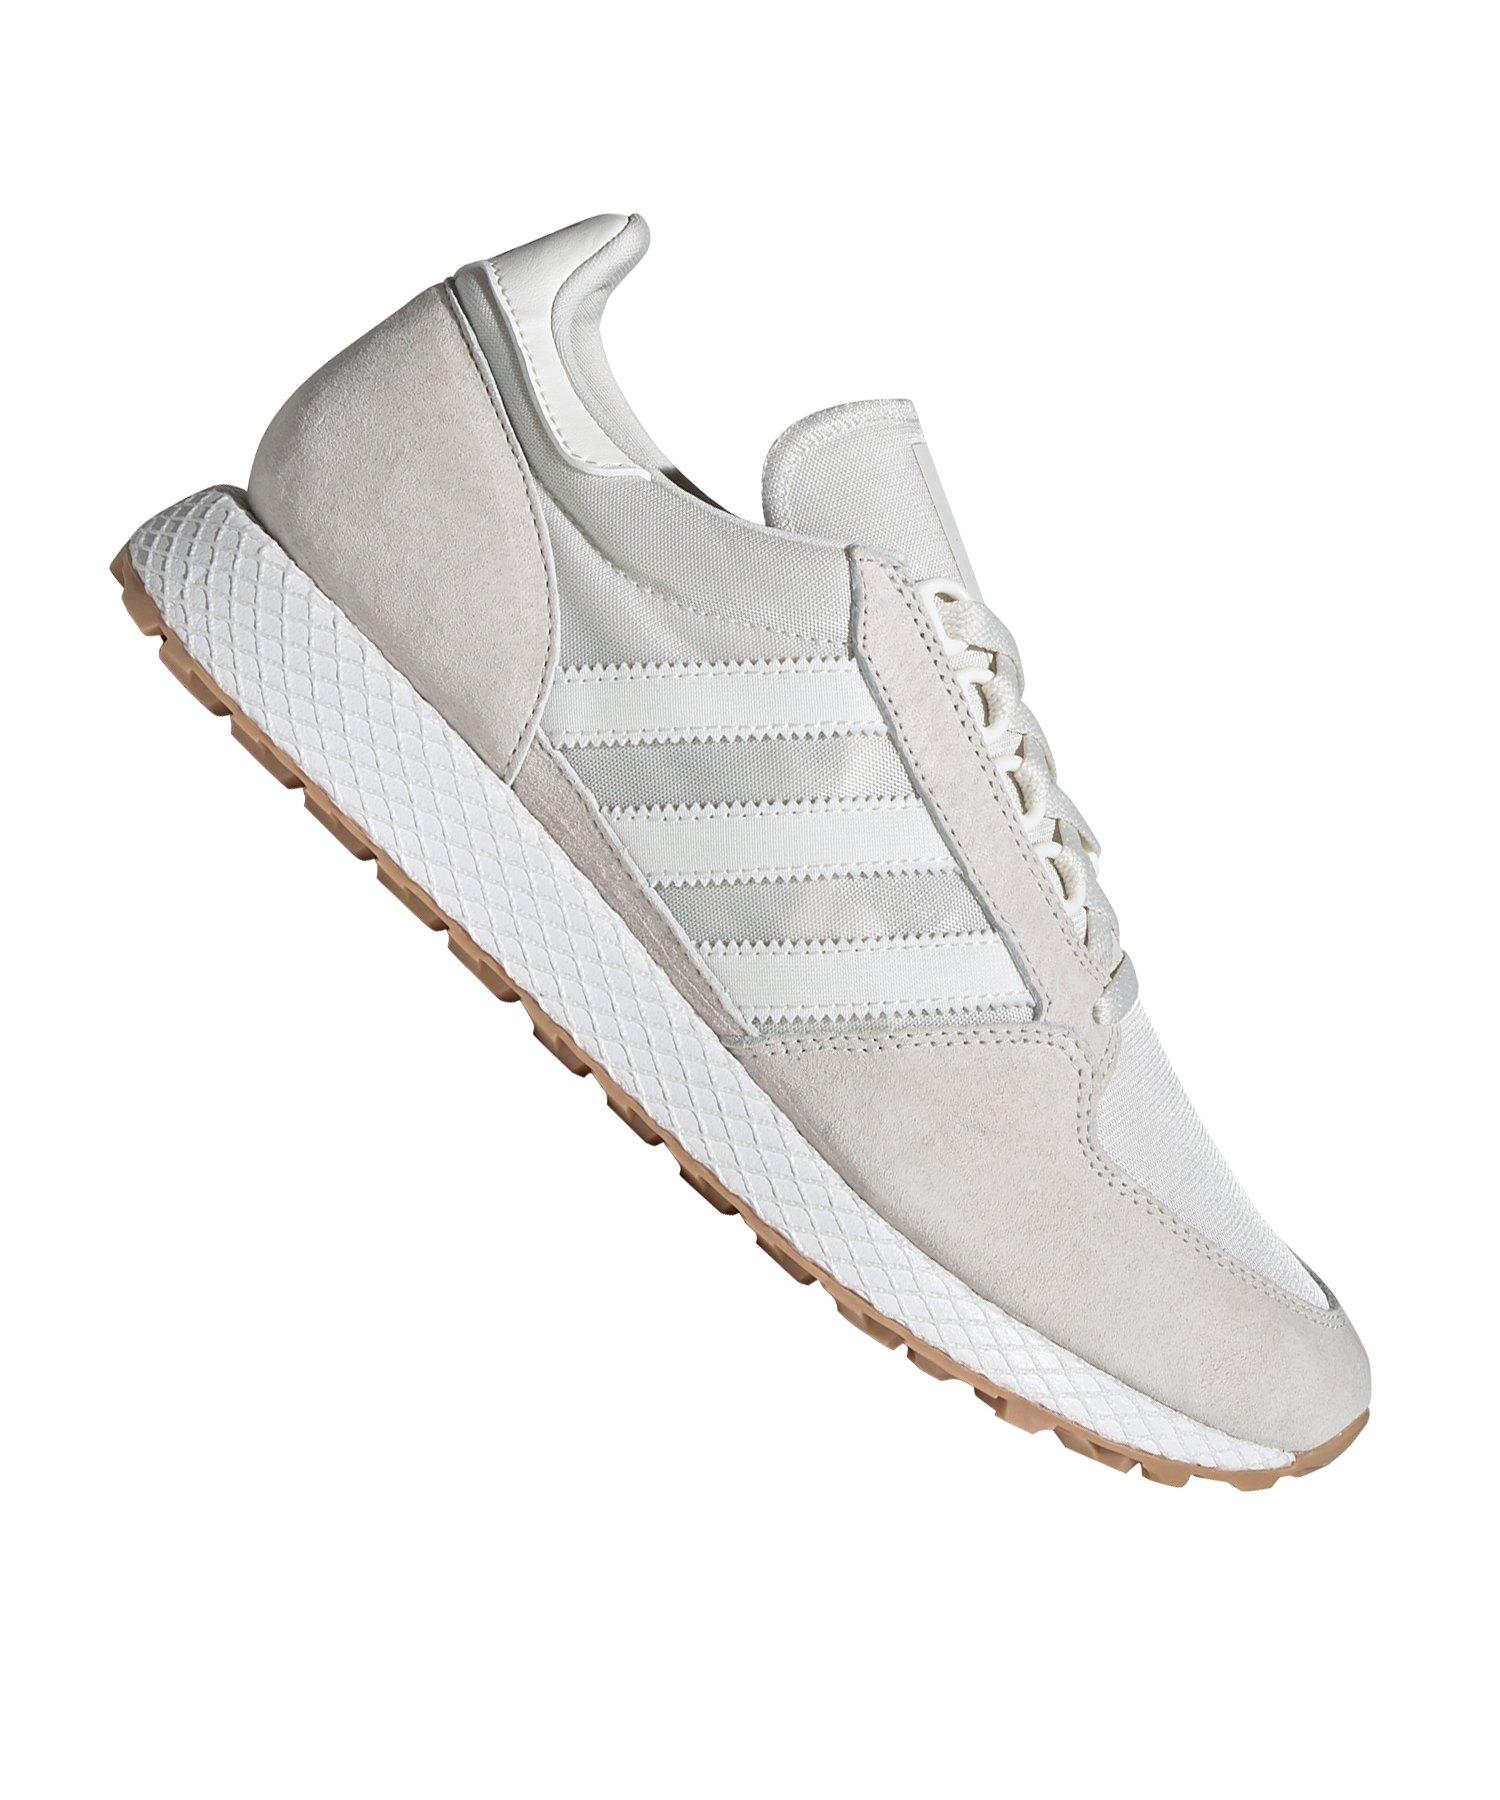 adidas Originals Forest Grove Sneaker Grau Weiss